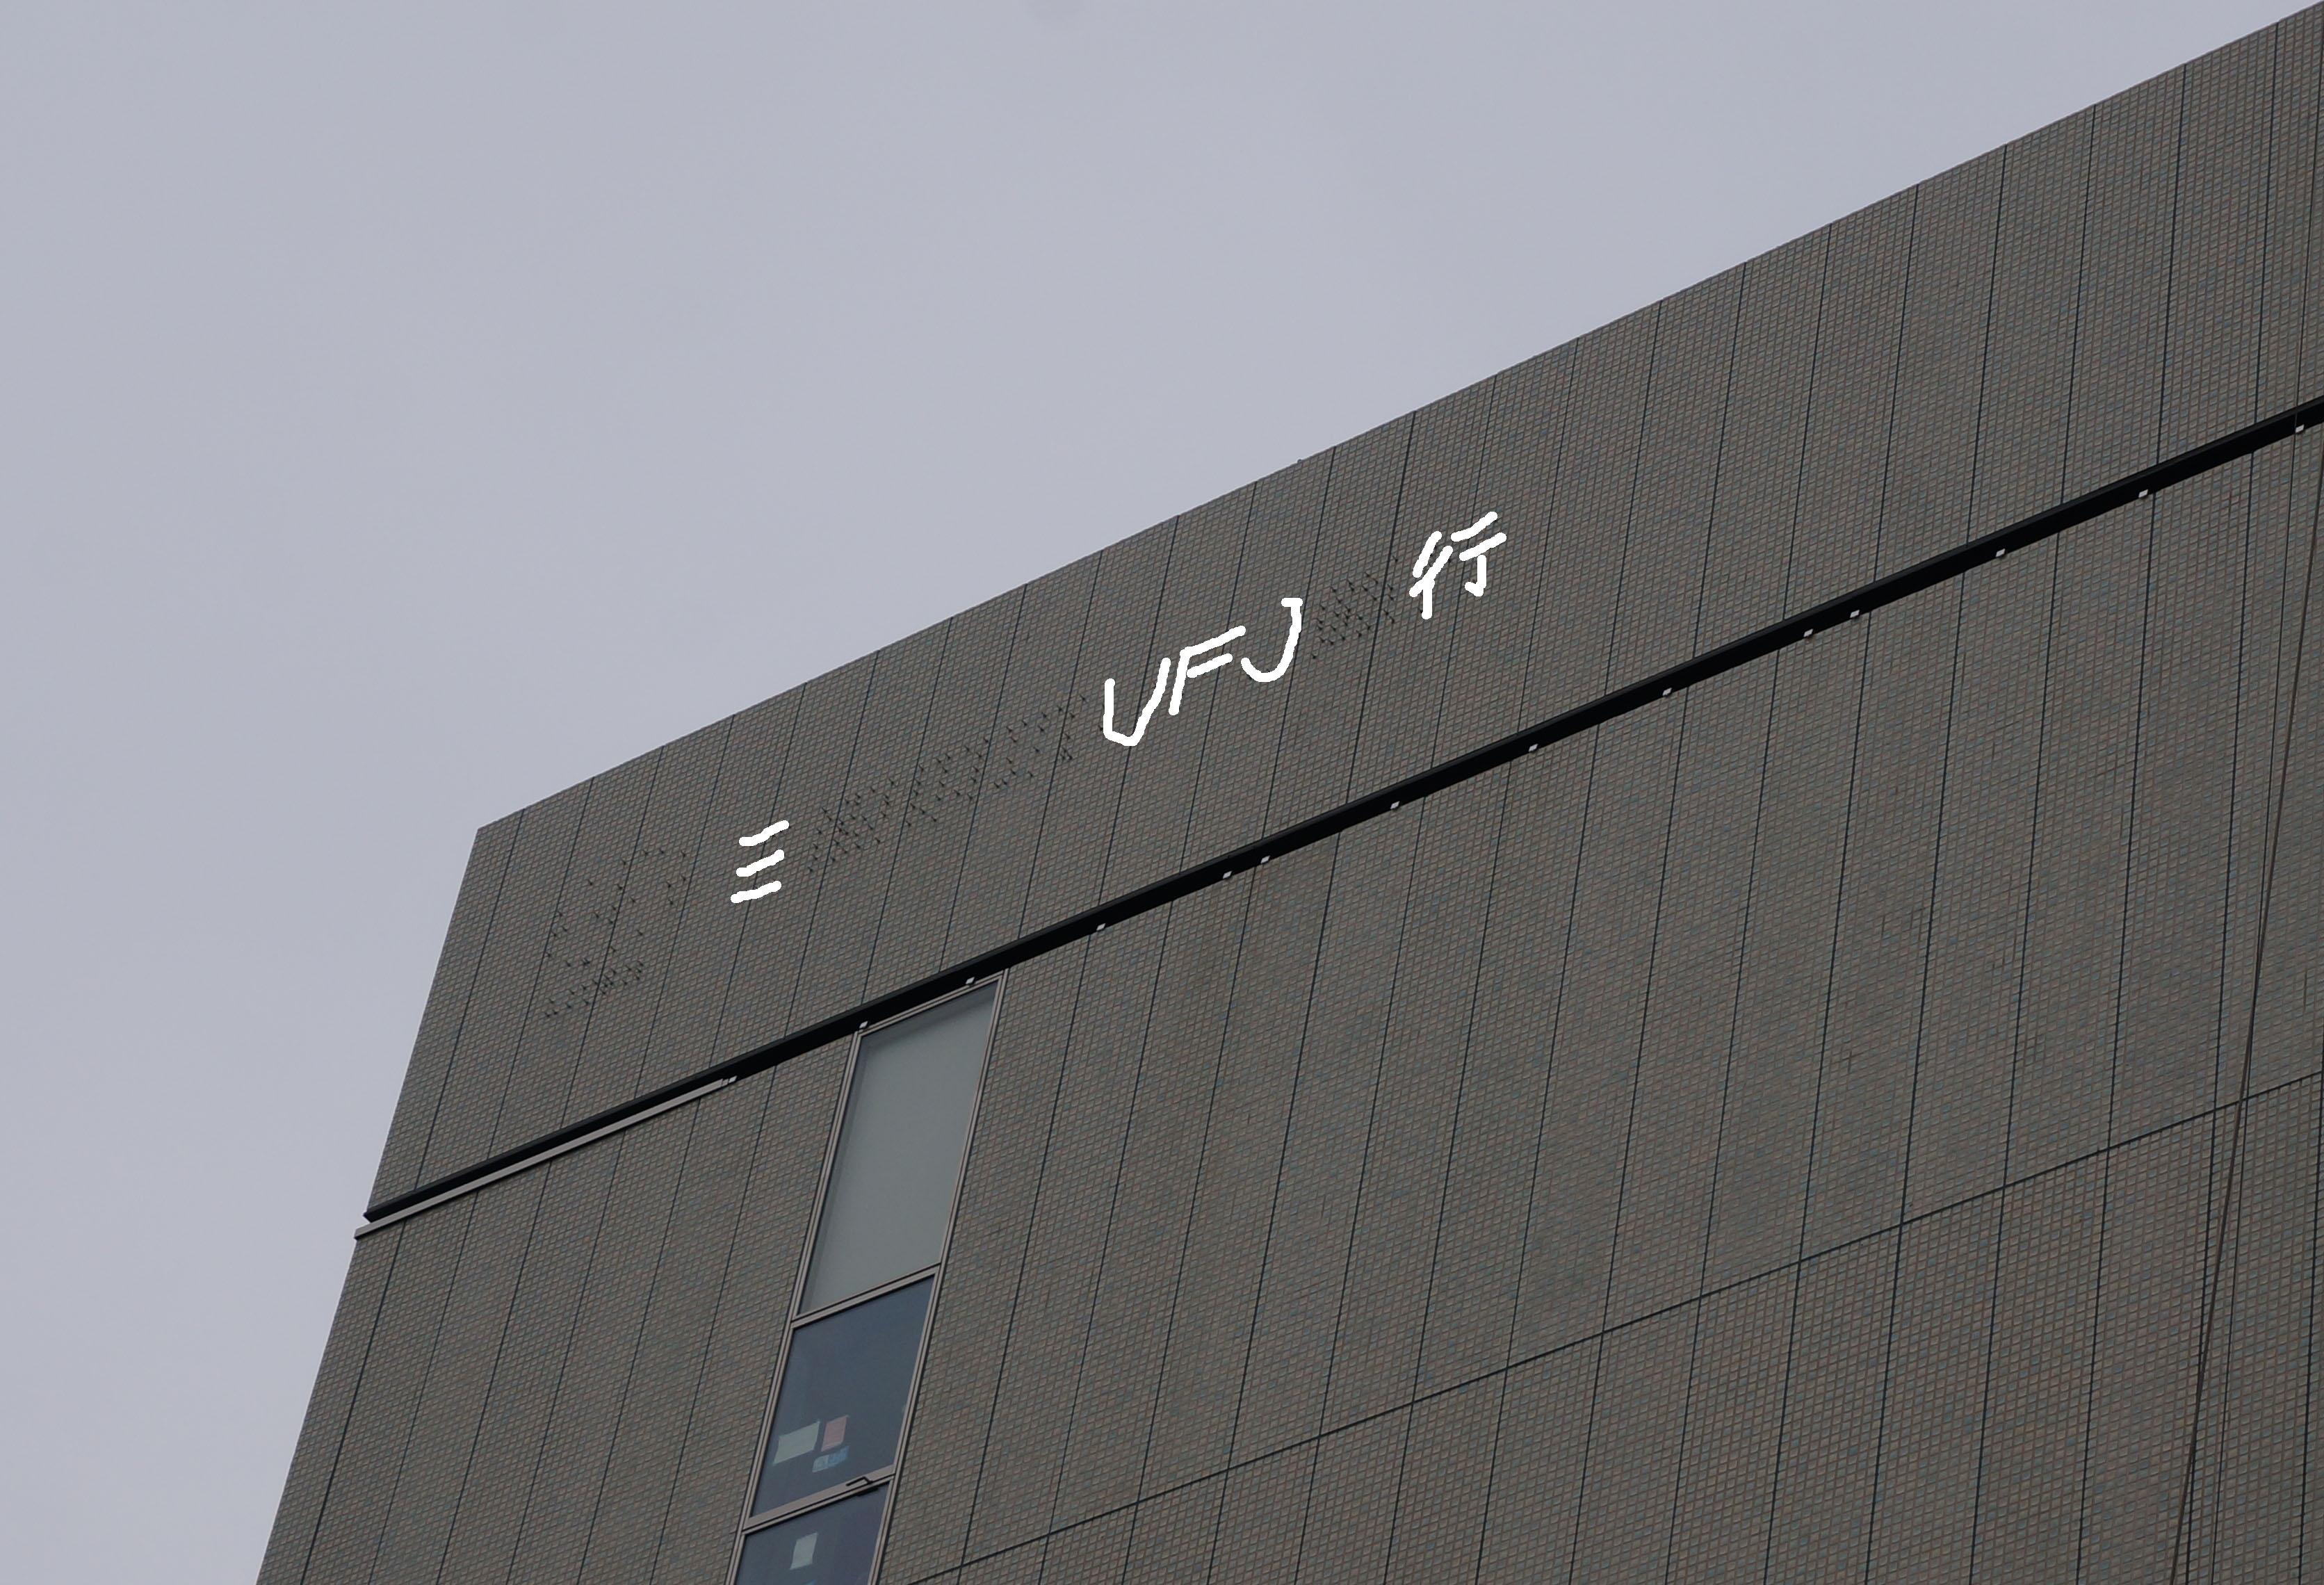 moji三菱UFJ壁の文字DSC00686